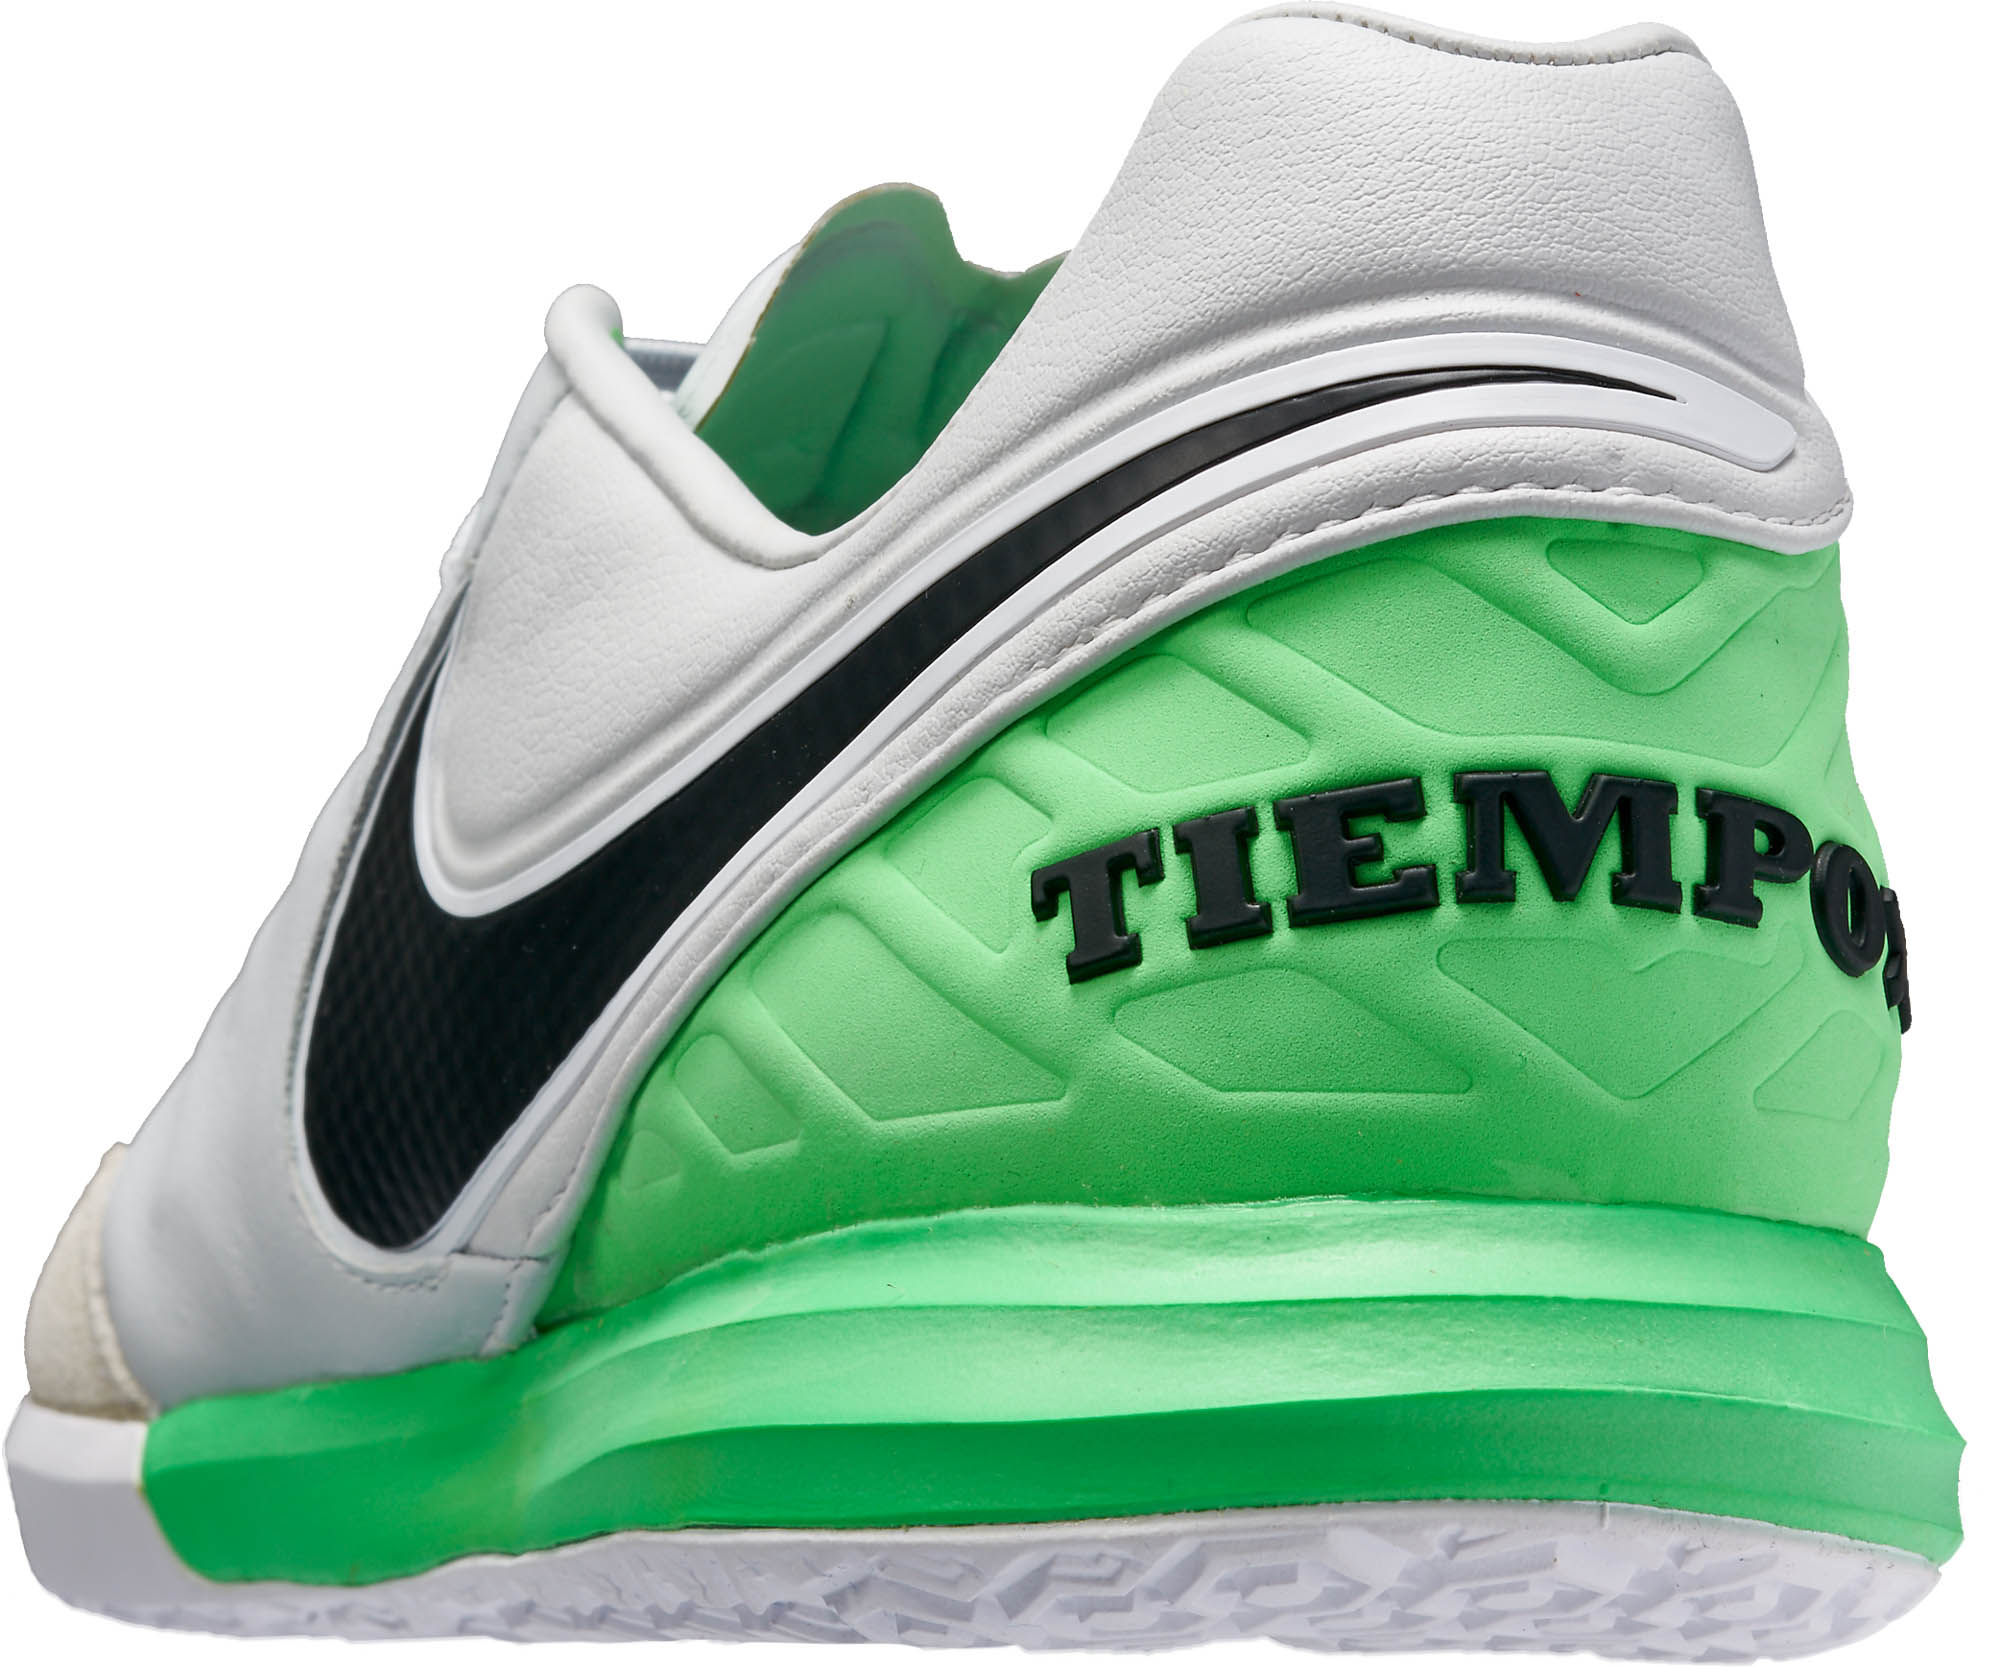 93907059310 Nike TiempoX Proximo IC - Silver SCCRX Indoor Shoes